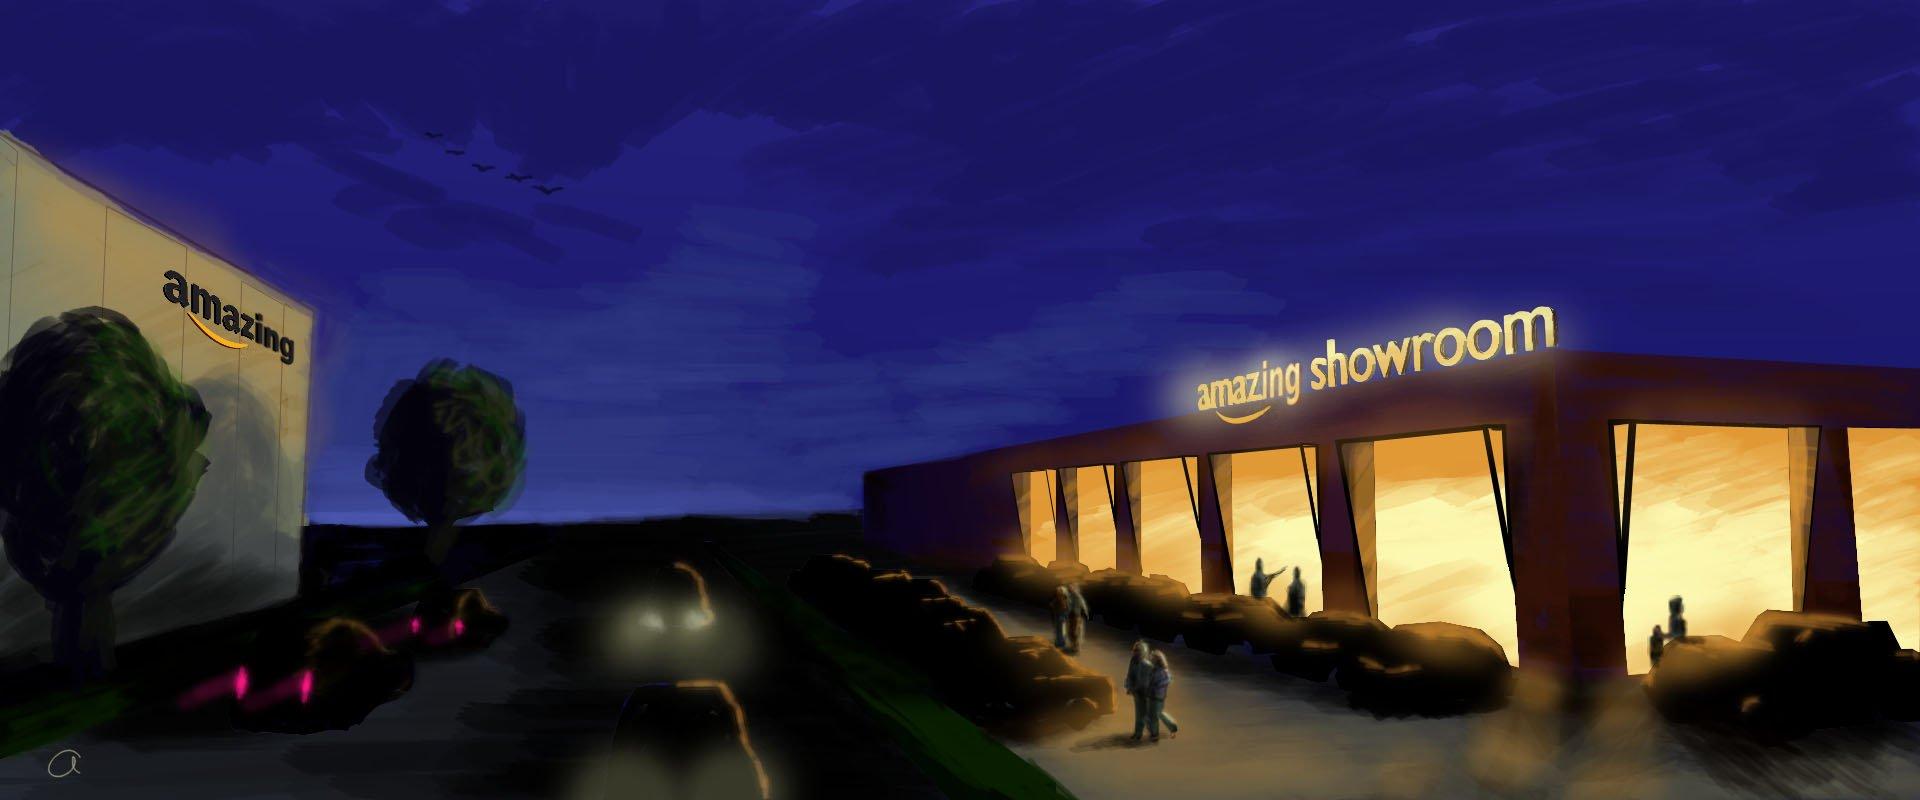 amazing-showrooms